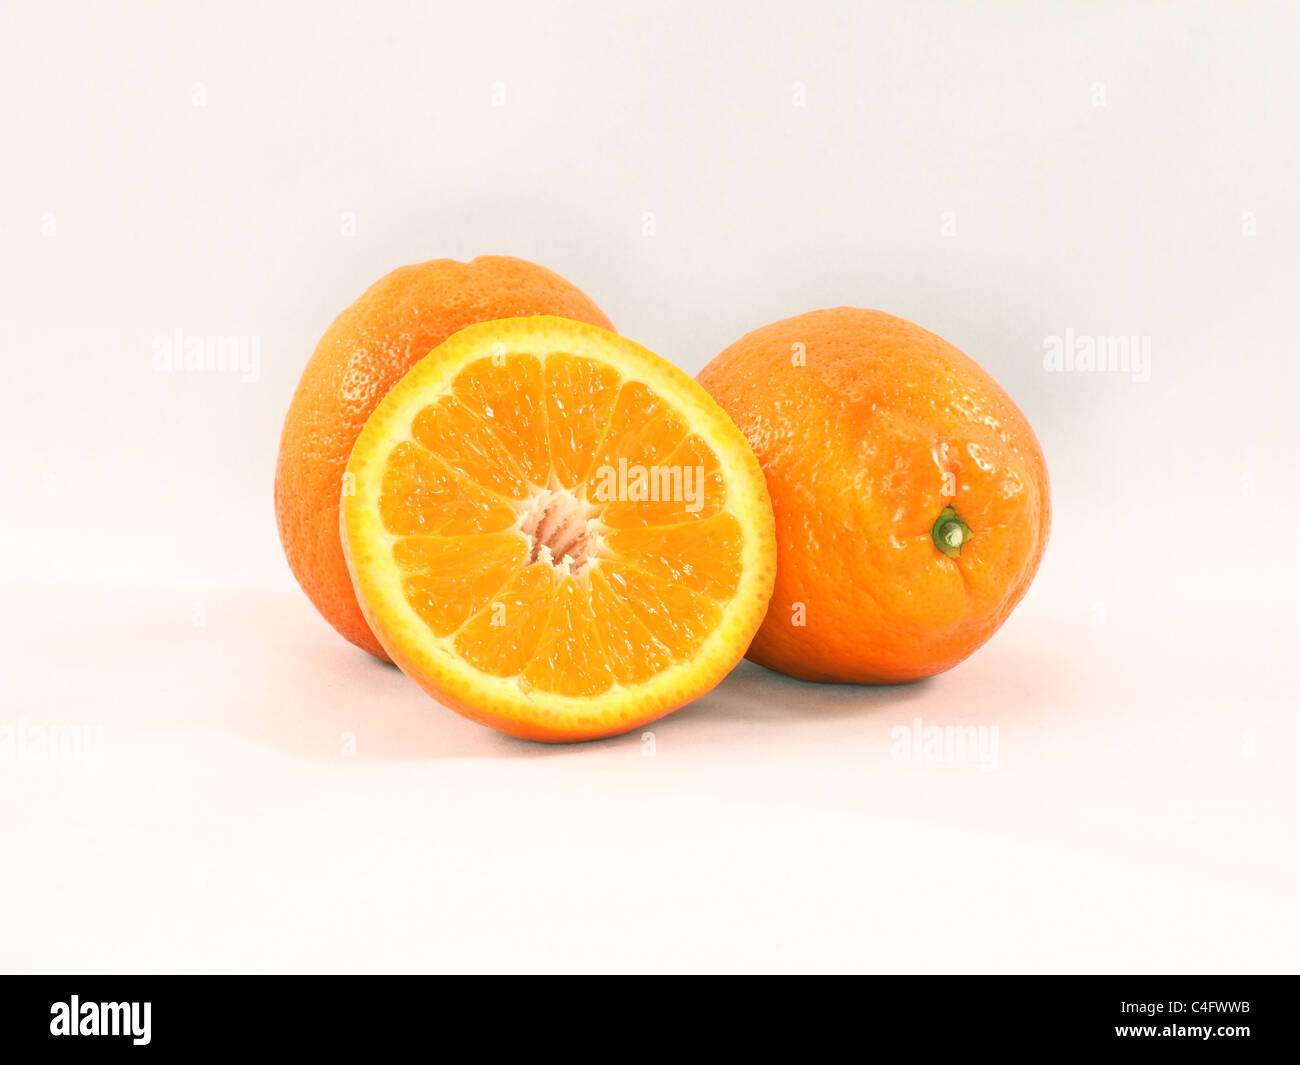 Three ripe Minneola tangelo oranges, one sliced in half. - Stock Image